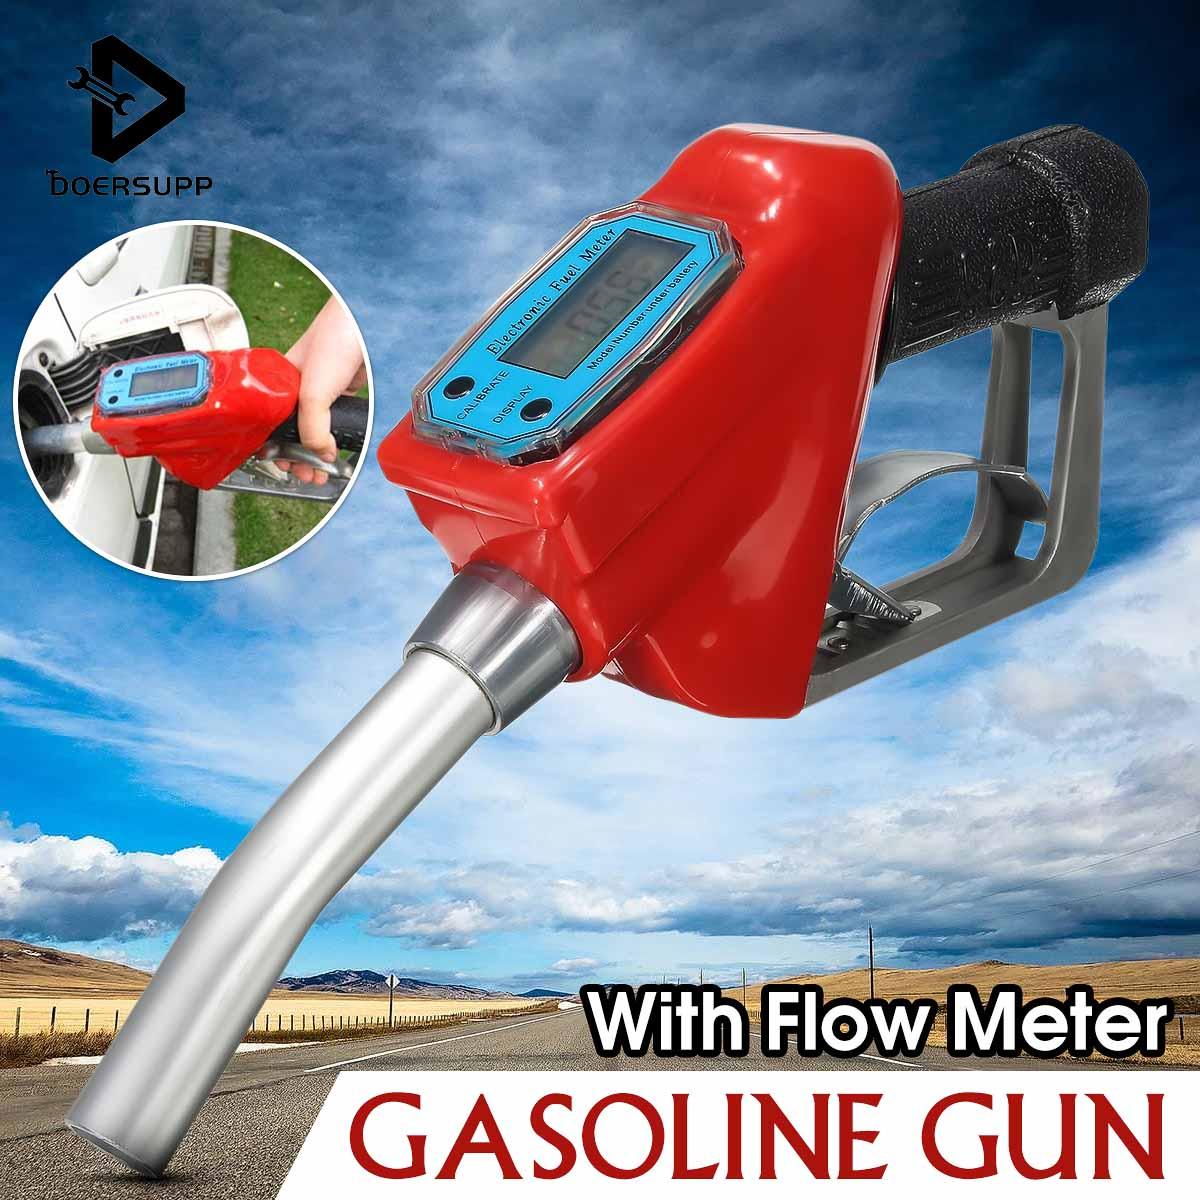 Doersupp Gas Flow Meter Sensor Flowmeter Indicator Counter Fuel Gauge Oil Delivery Gun Nozzle Gasoline Station Oil Refueling Gun цена